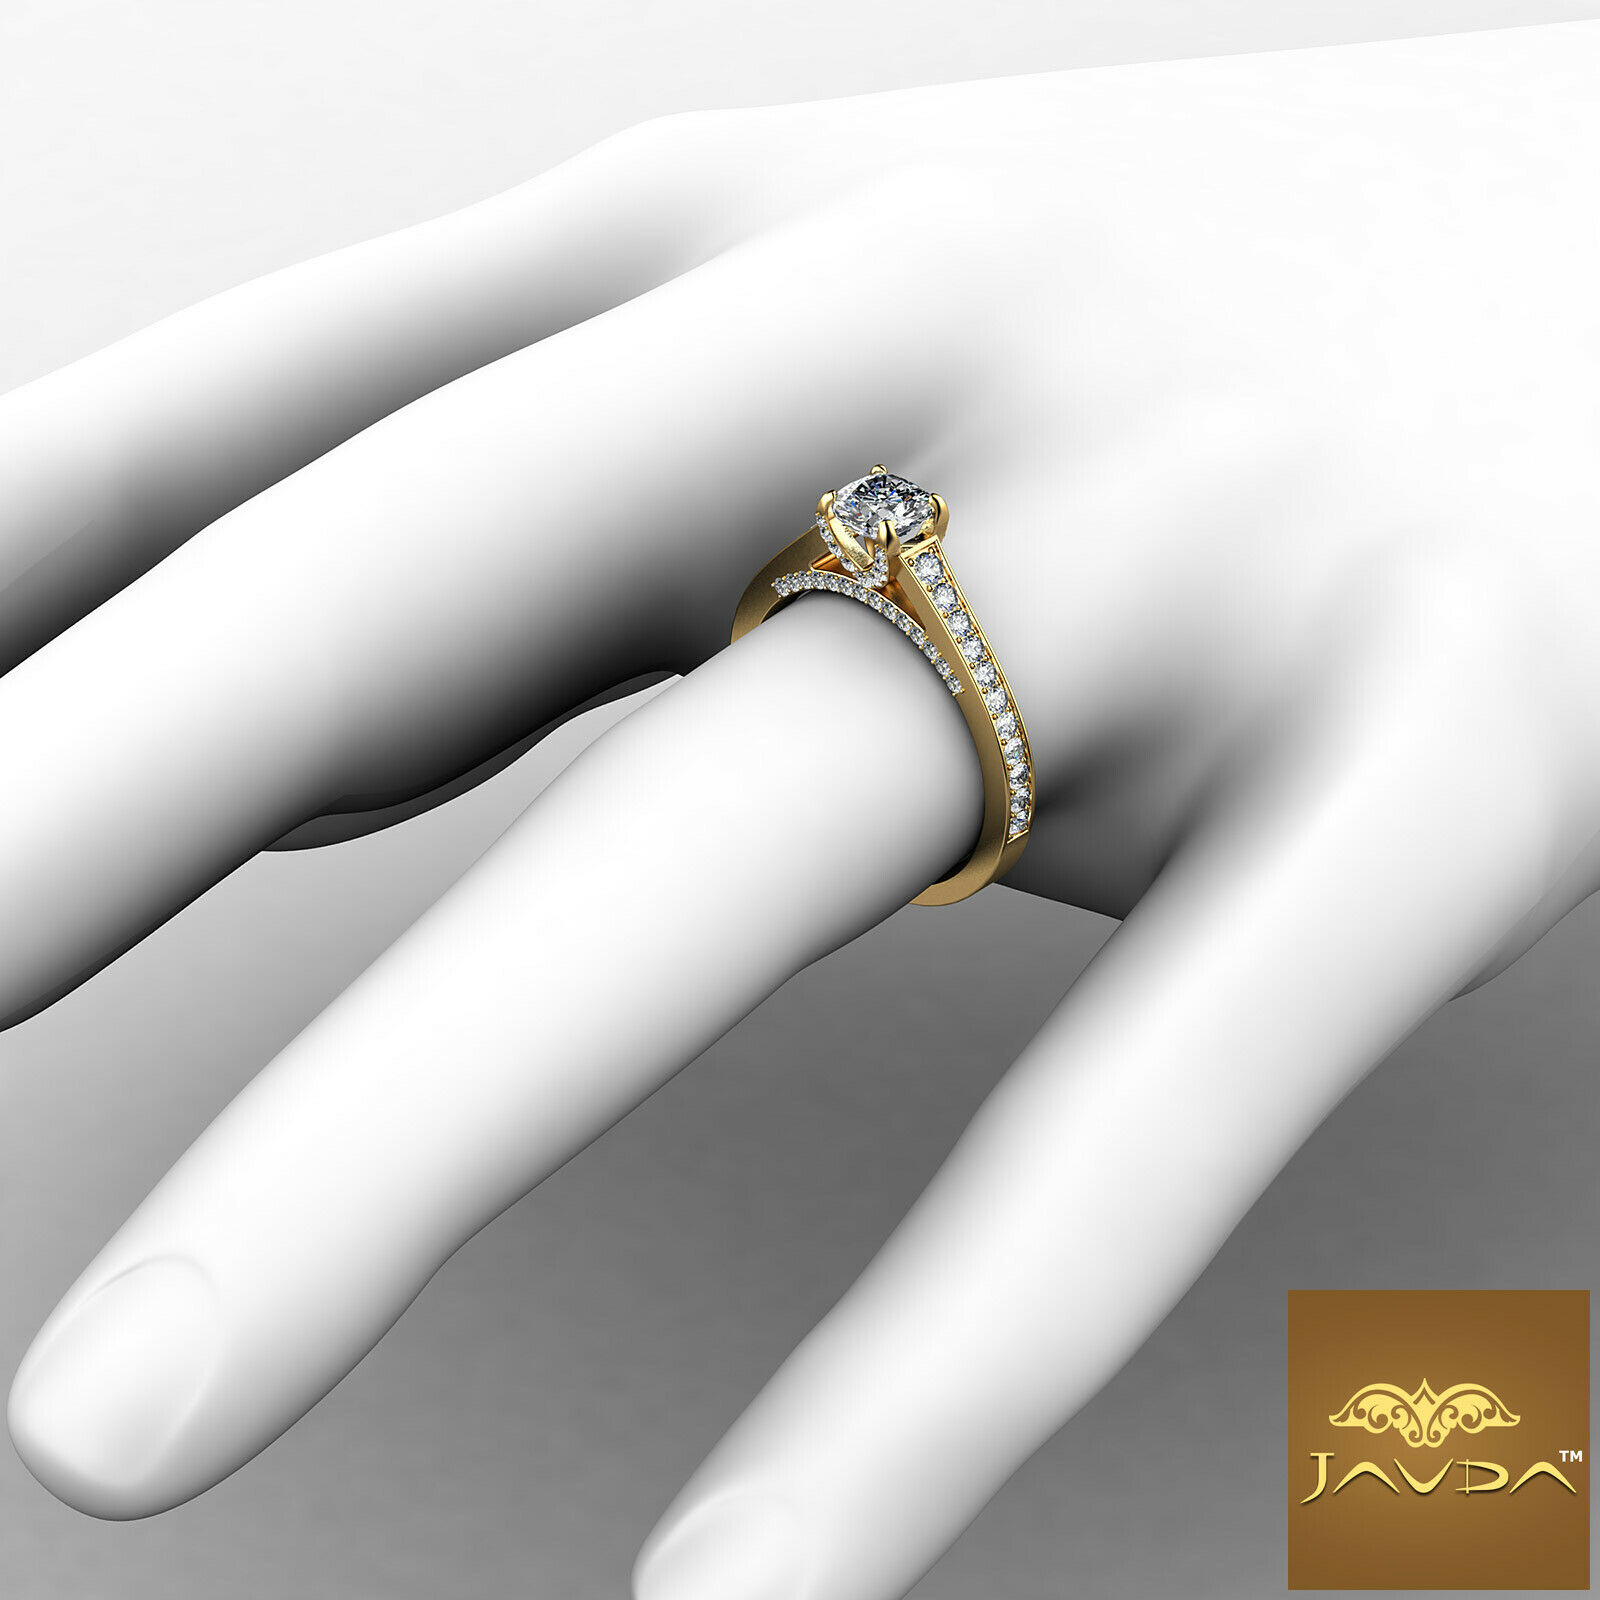 Cushion Cut Diamond Flawless Engagement GIA G VVS2 Pave Set Ring Platinum 1.25Ct 7